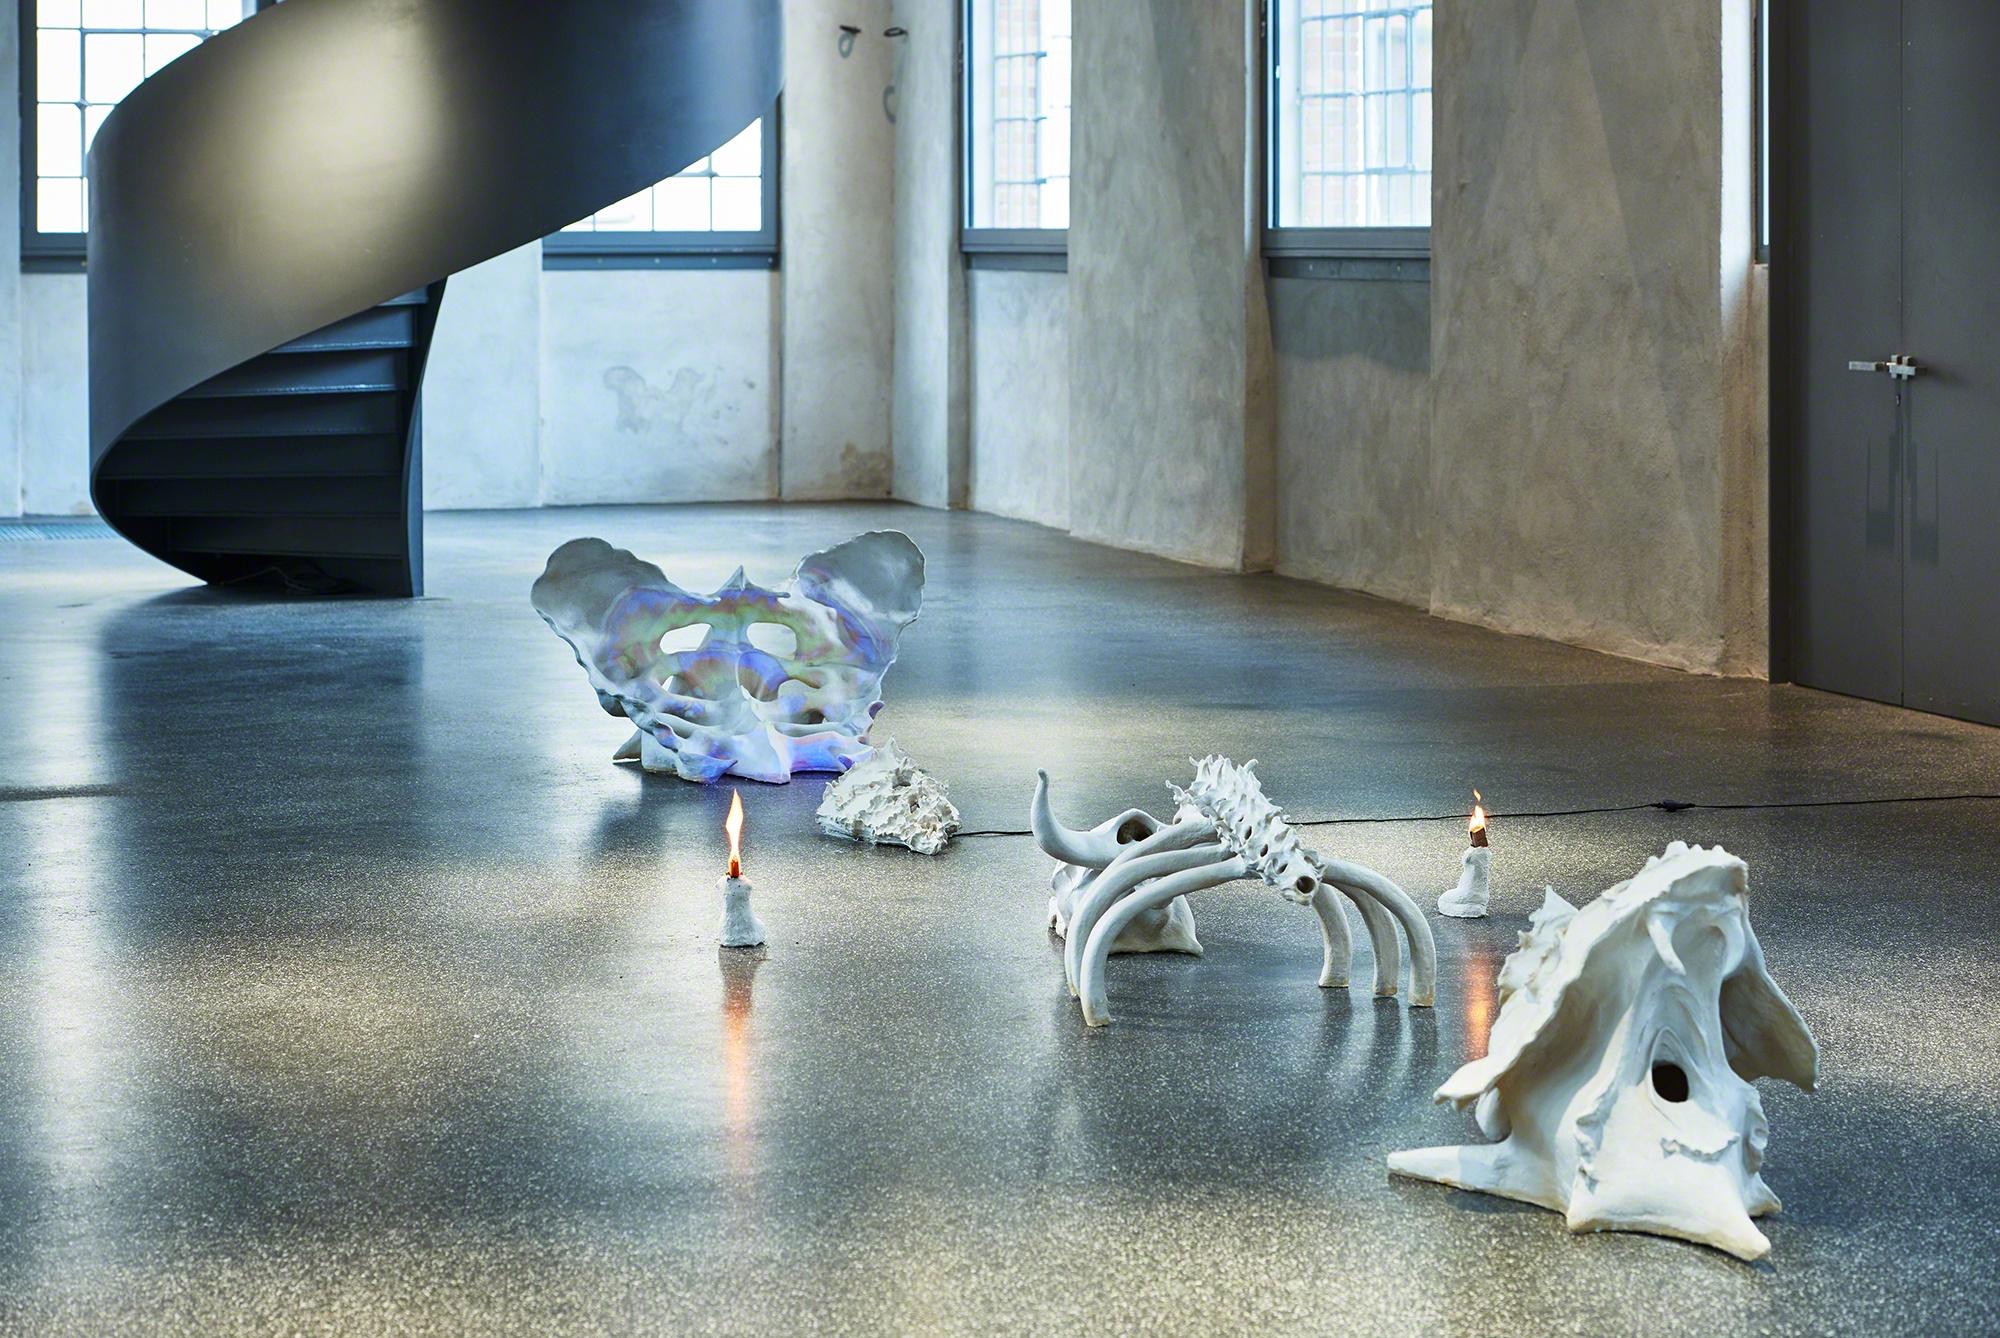 Niloufar Shirani,IKKG, Keramik, Installation, Sayner Hütte, Bendorf, Kunst, Skelett, Produkt, Fotografie, Produktfotografie, Articus und Röttgen Fotografie, Koblenz, Köln, Bonn, Brohl-Lützing